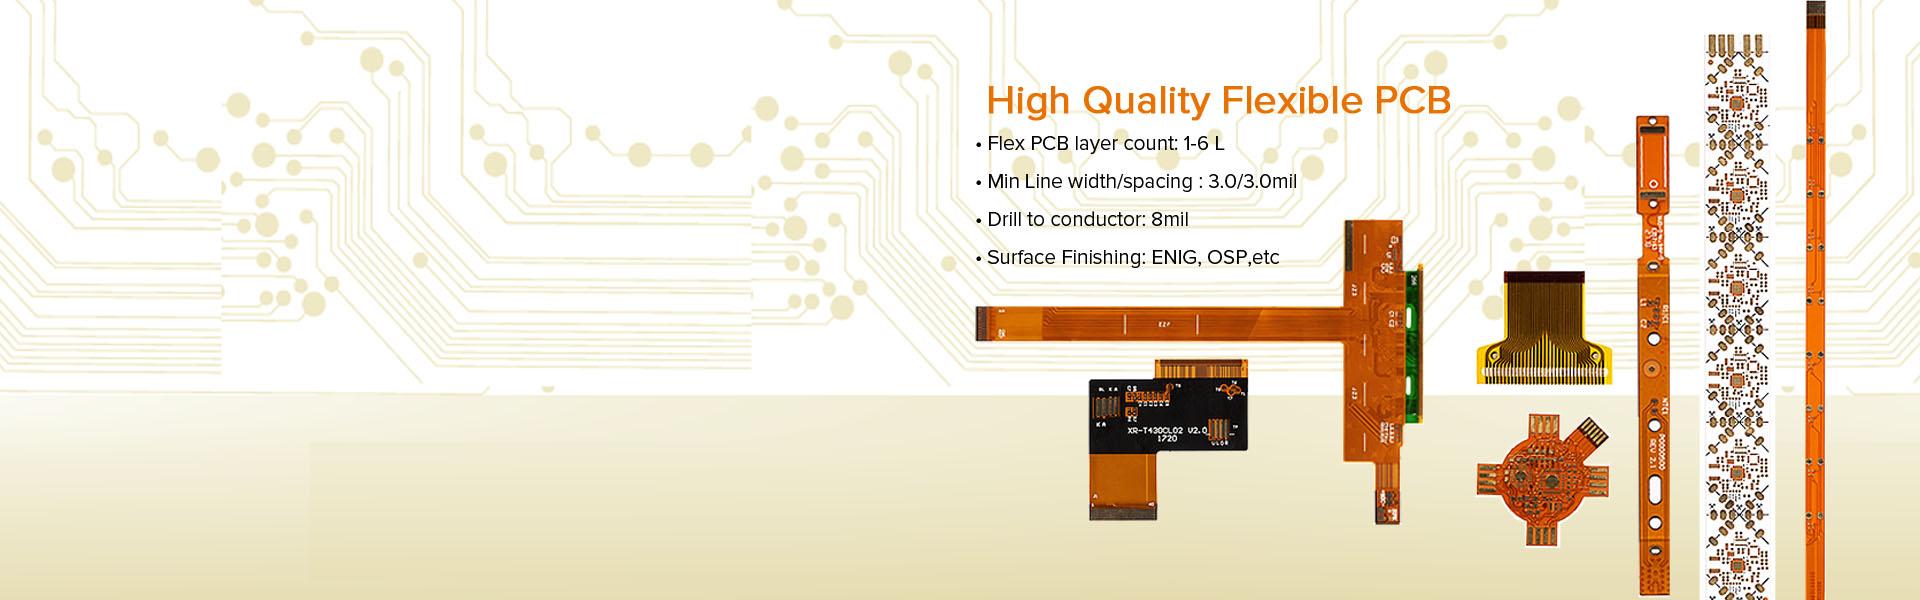 King Credie | Printed Circuit Board (PCB) Manufacturing